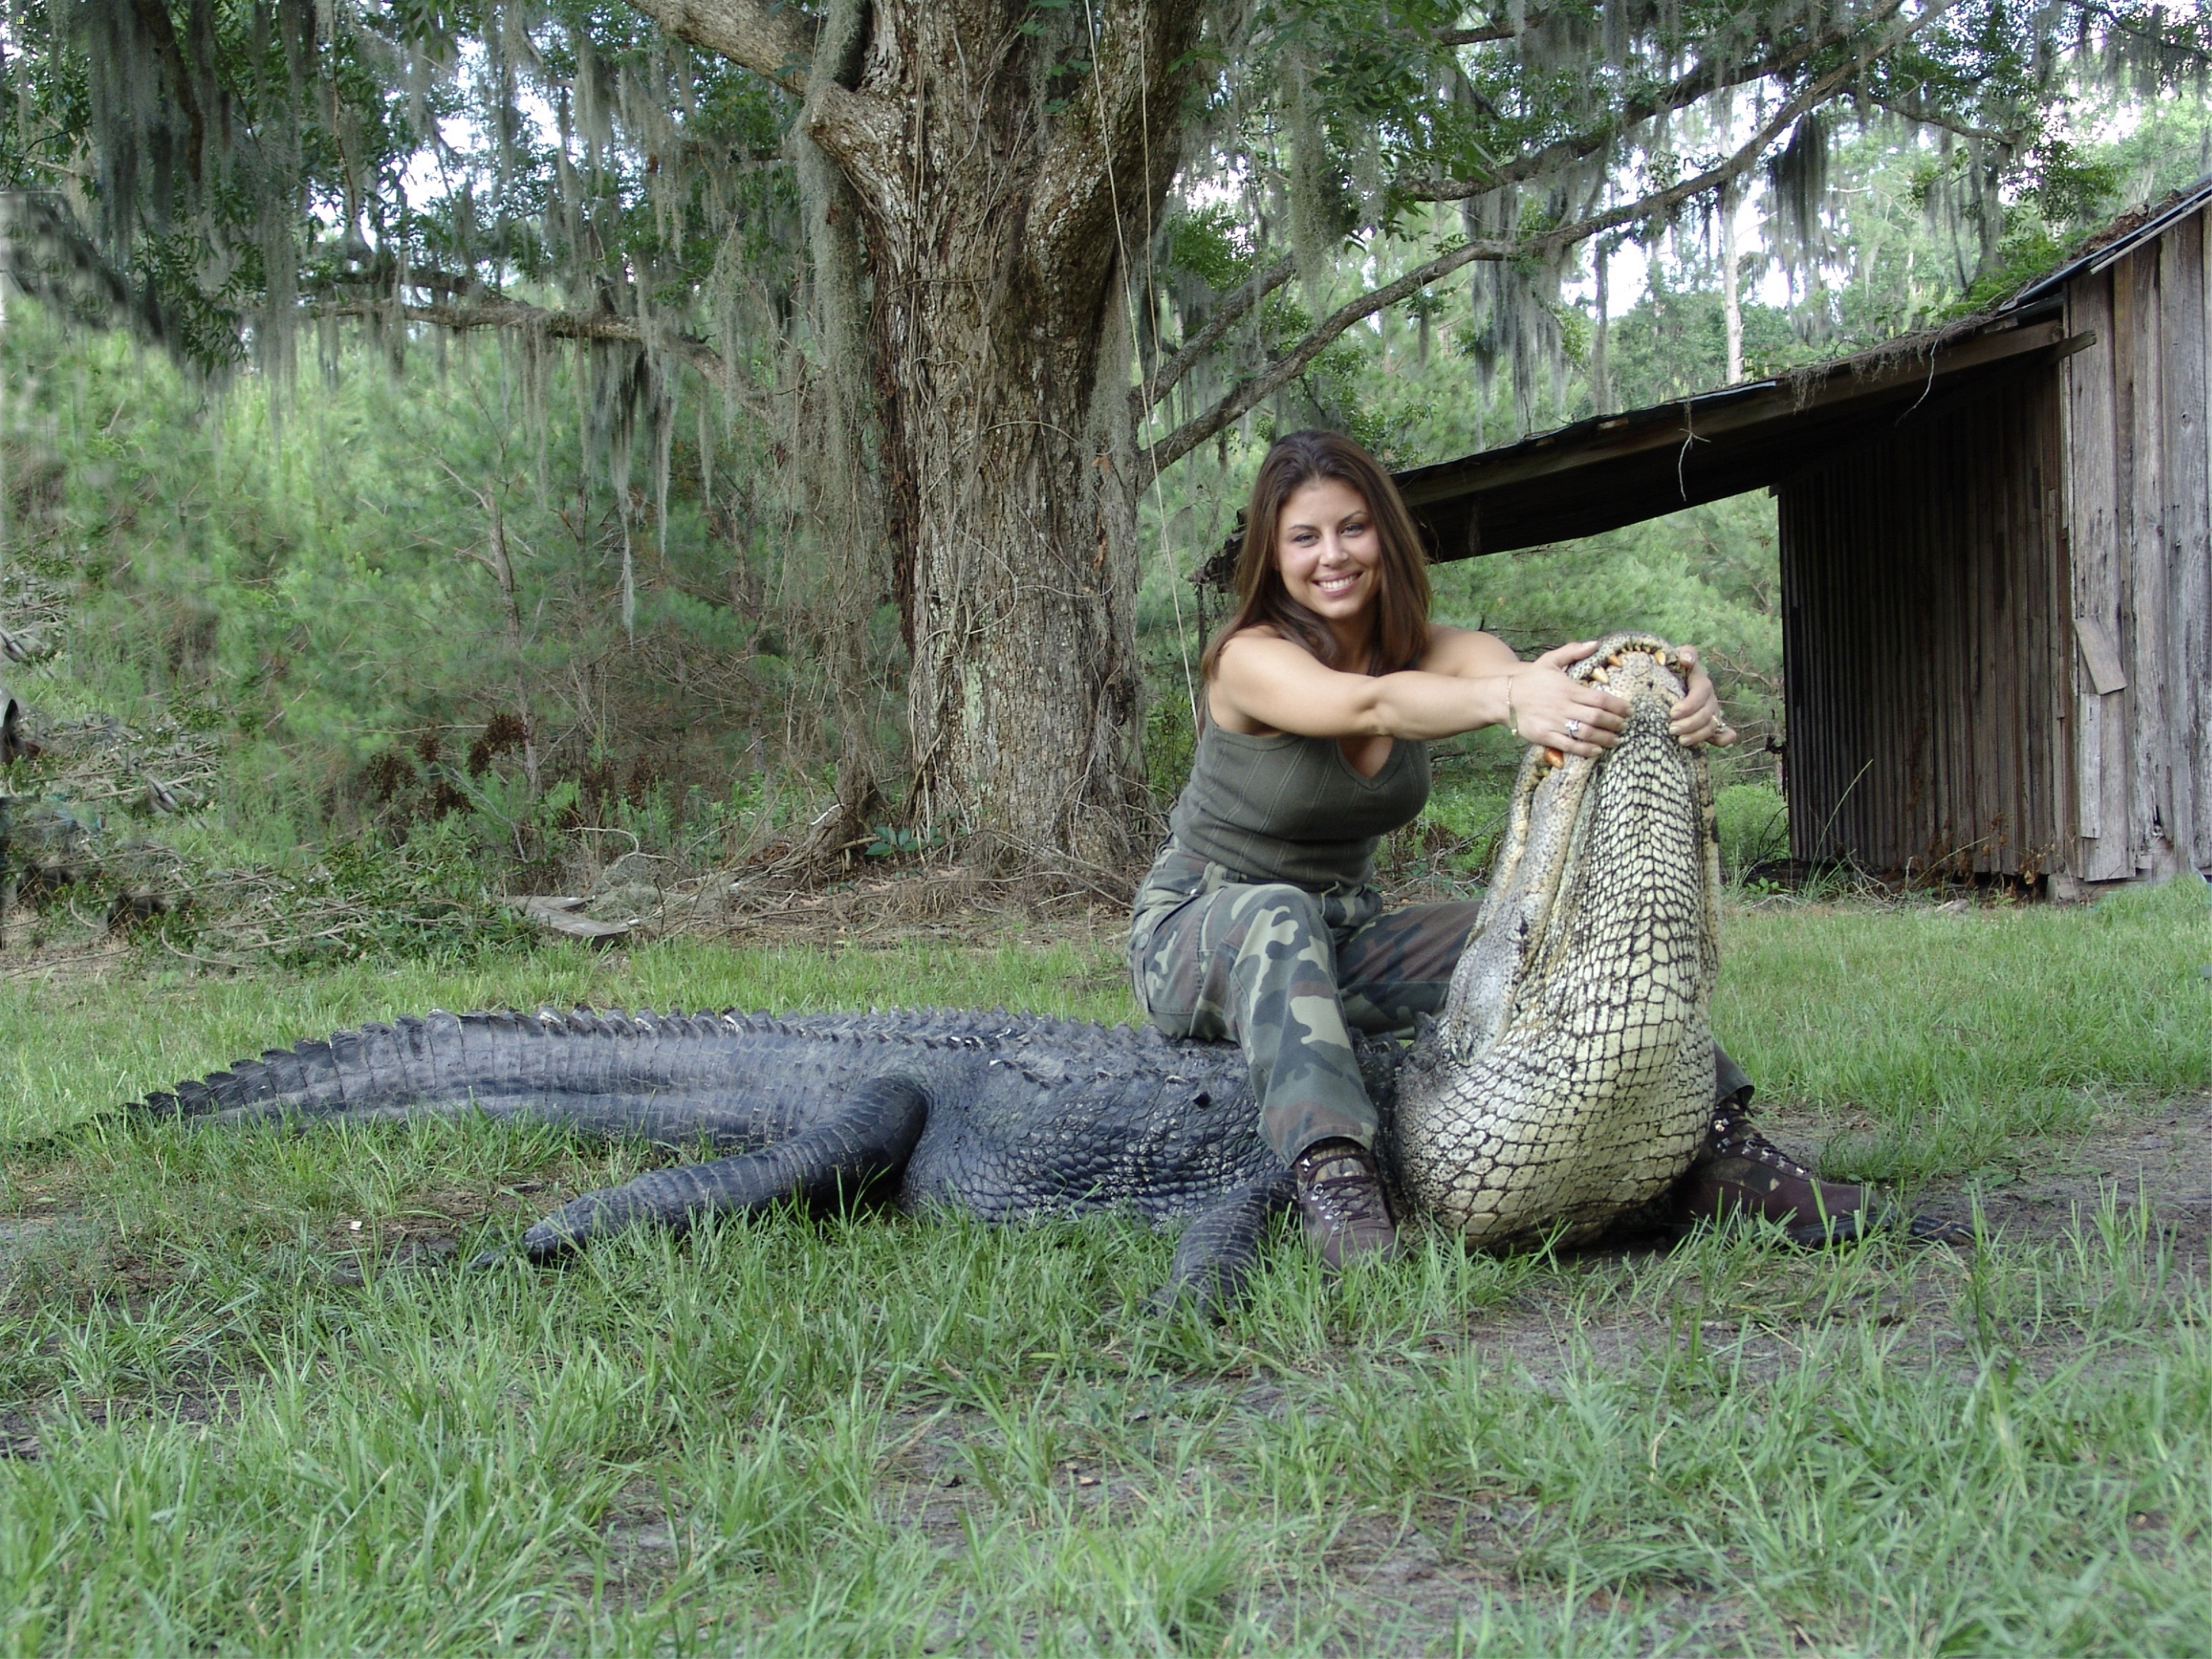 ATTO-S03-Florida-Gina-Gator-001